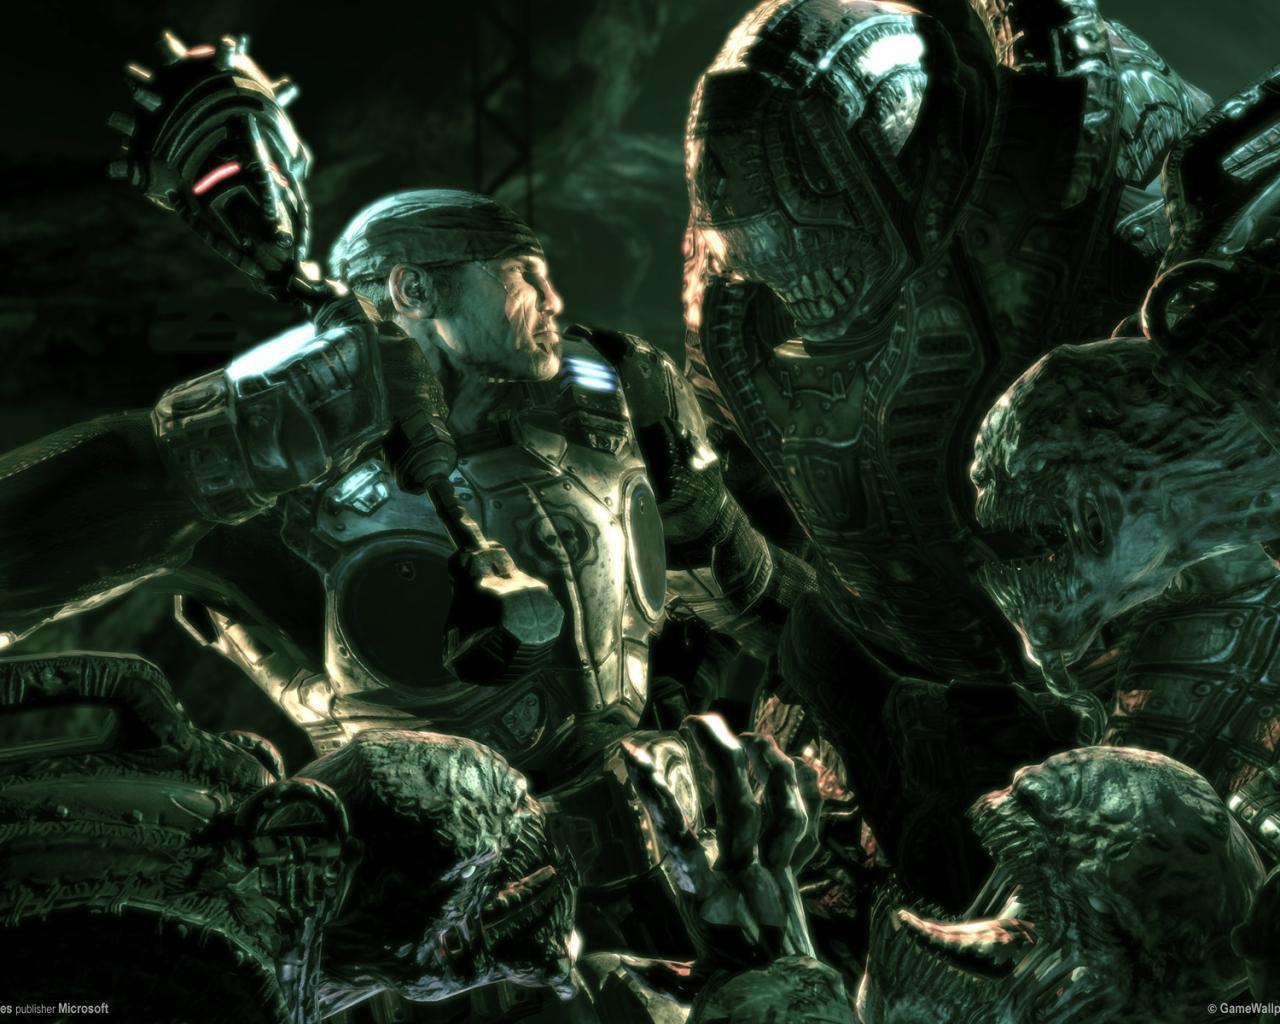 Обои игры игра Games Pubg Playerunknowns картинки на: Gears Of War, Game, Pc Games, игра, видео игры